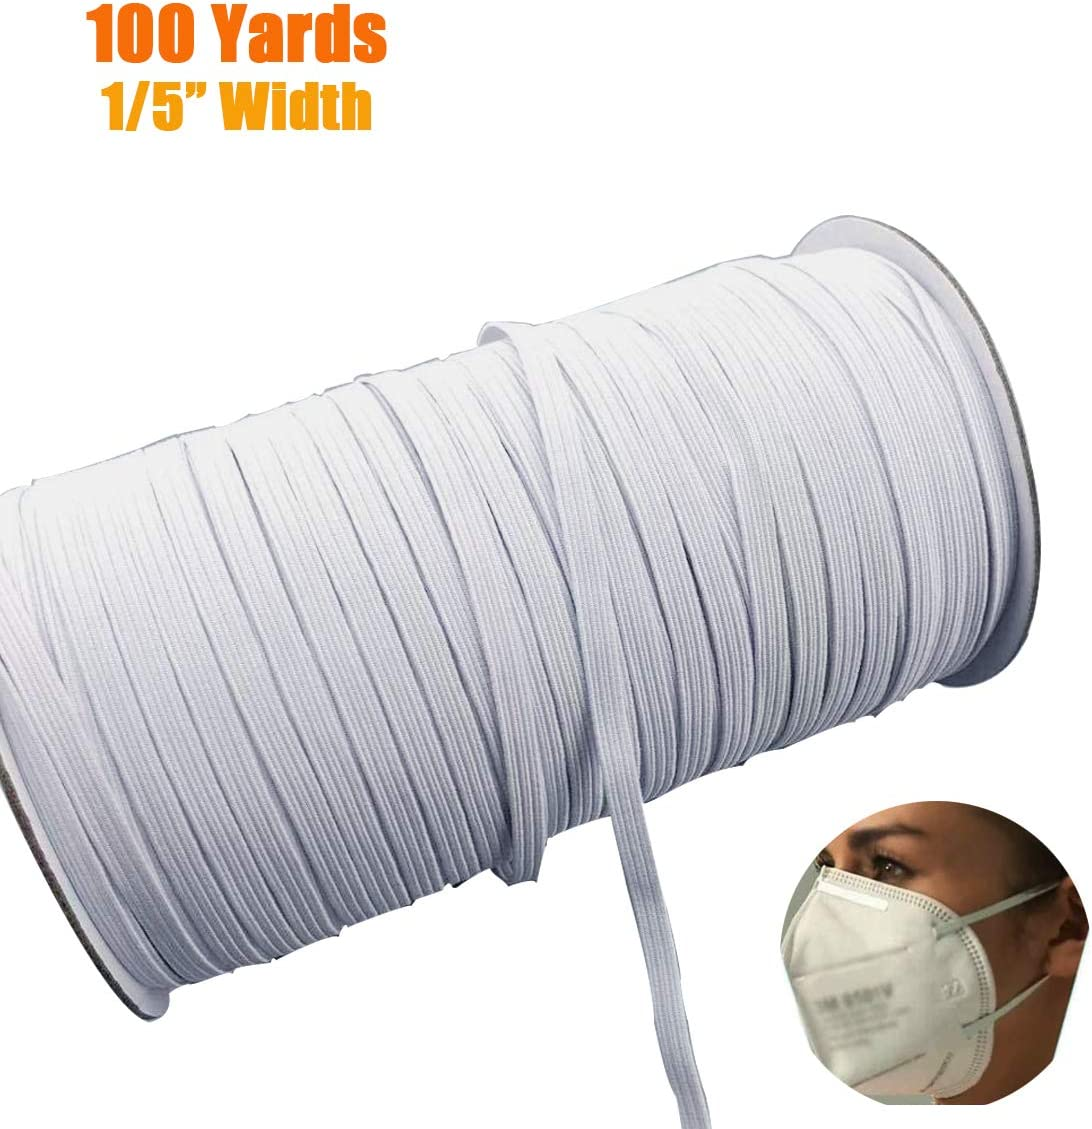 MYUREN 200 Yards Length 1//8 Inch Width Braided Elastic Band White Elastic Cord Heavy Stretch High Elasticity Knit Elastic Band for Sewing Crafts DIY Bedspread Cuff Mask